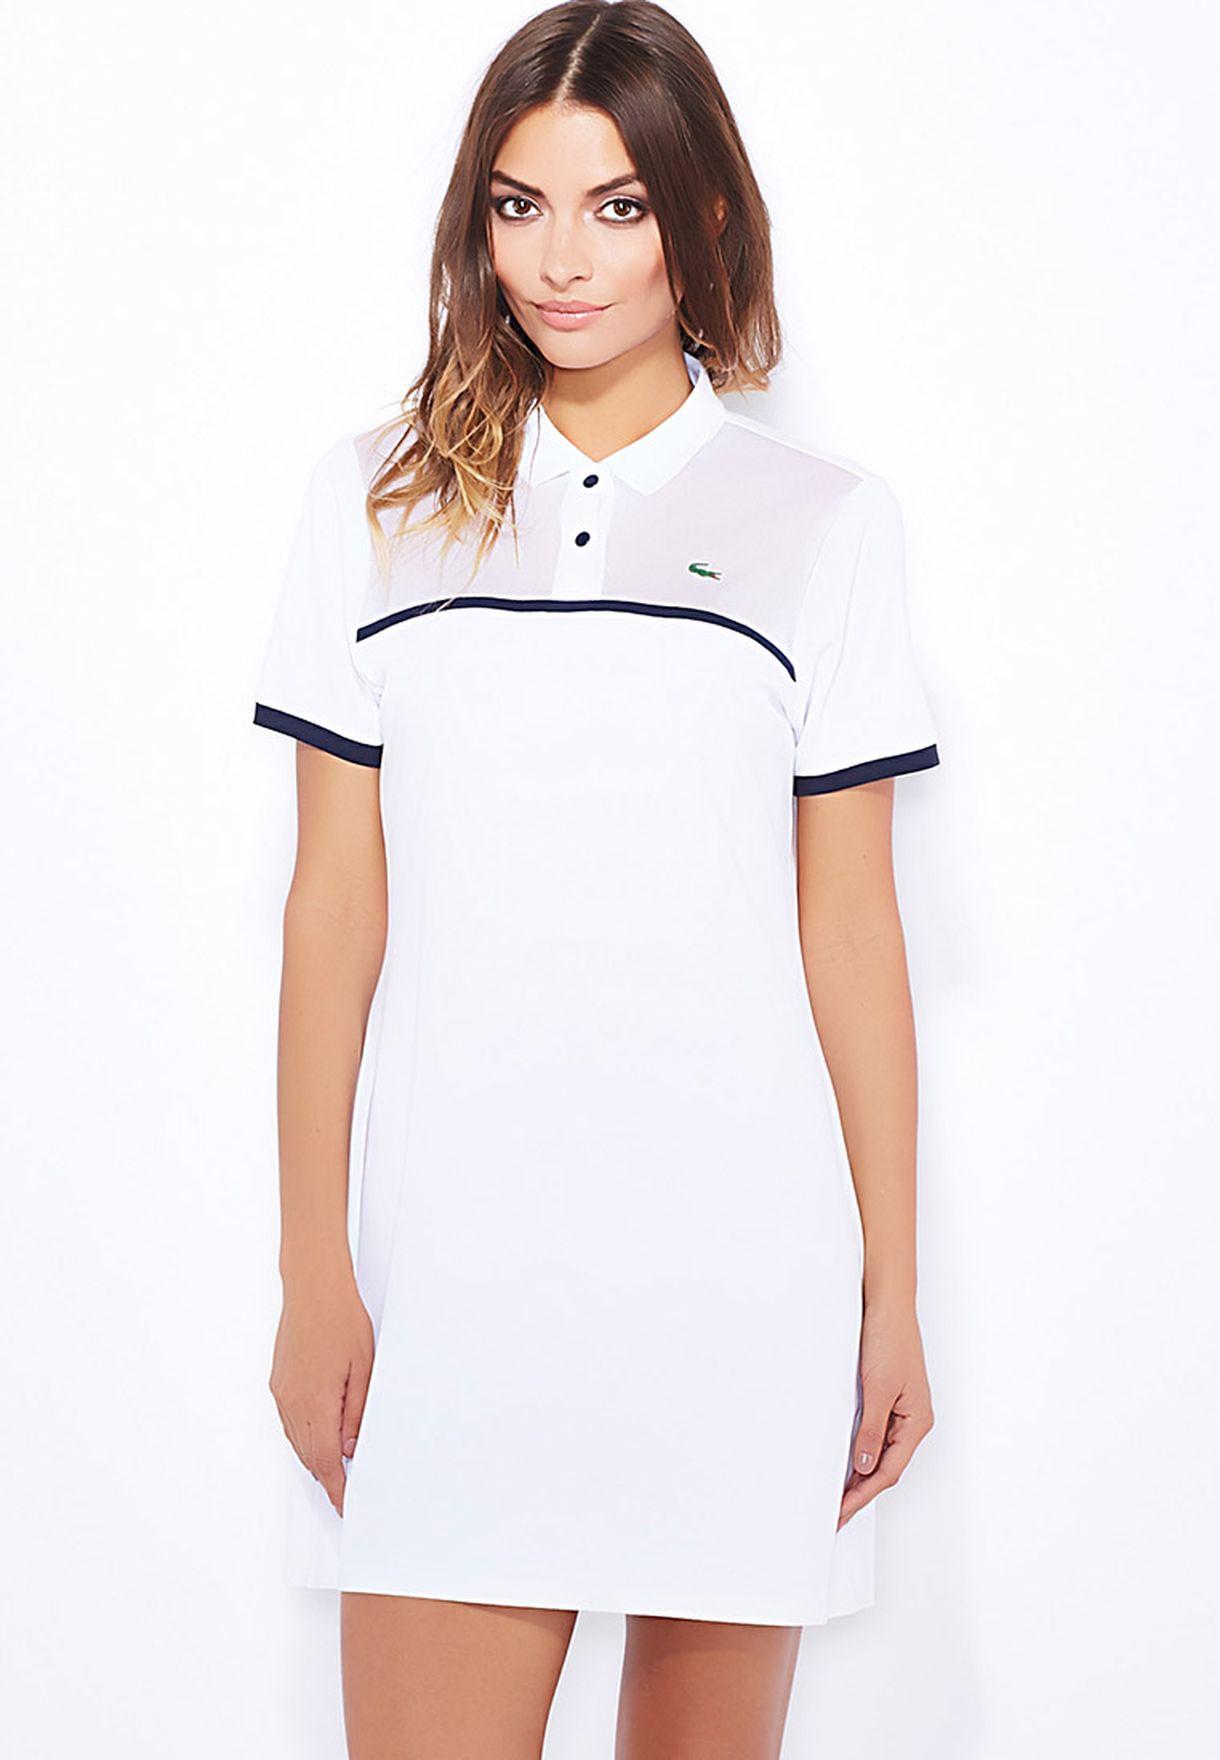 92c690b9e4b90 Shop Lacoste white Ribbed Collar Polo Dress EF7342-522 for Women in Qatar -  LA014AT04RUD